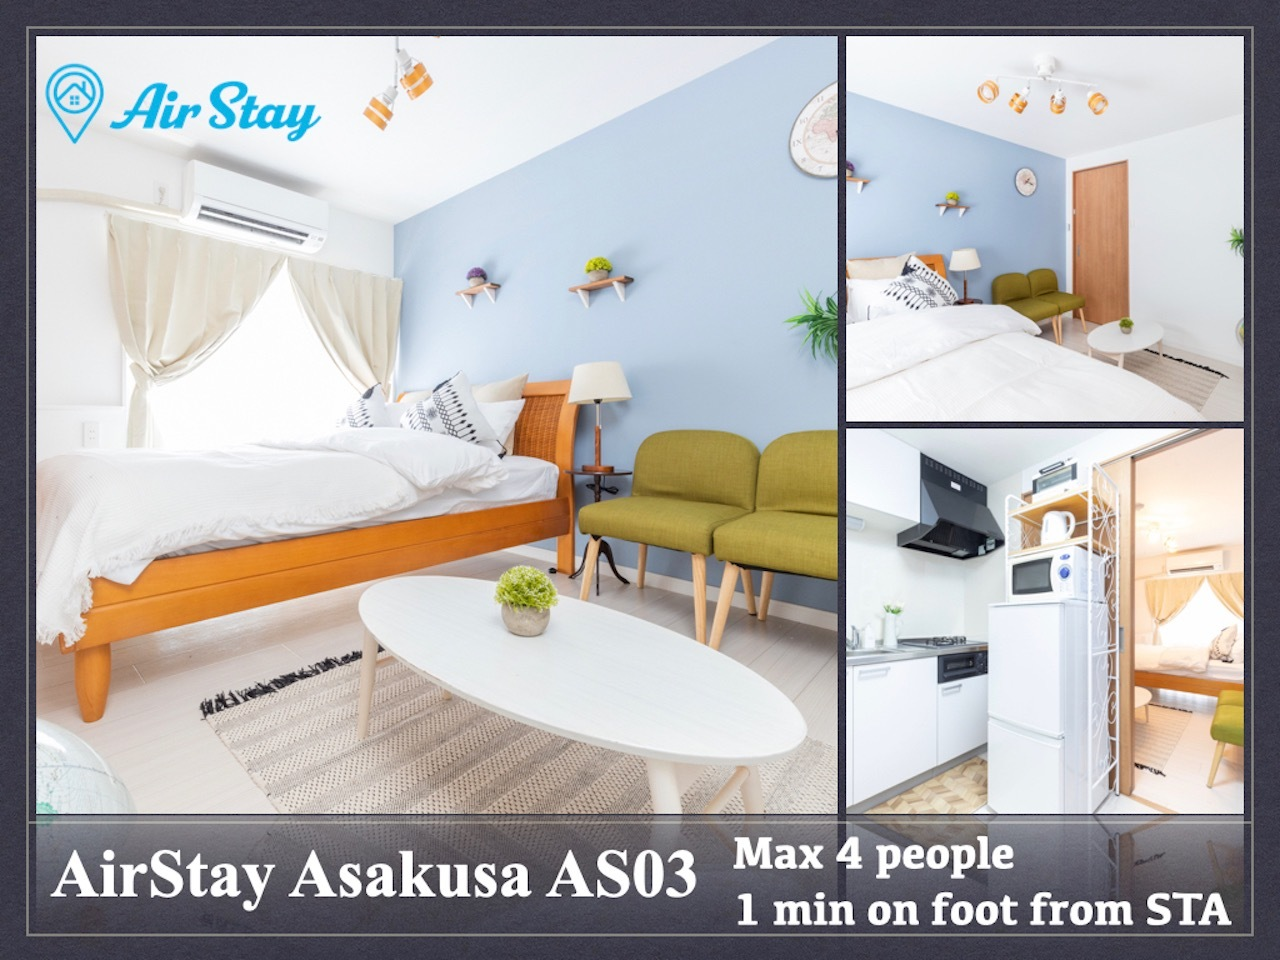 AirStay Asakusa AS03 /帰国滞在歓迎/早割長期割/空港ピックアップ/高速WiFi